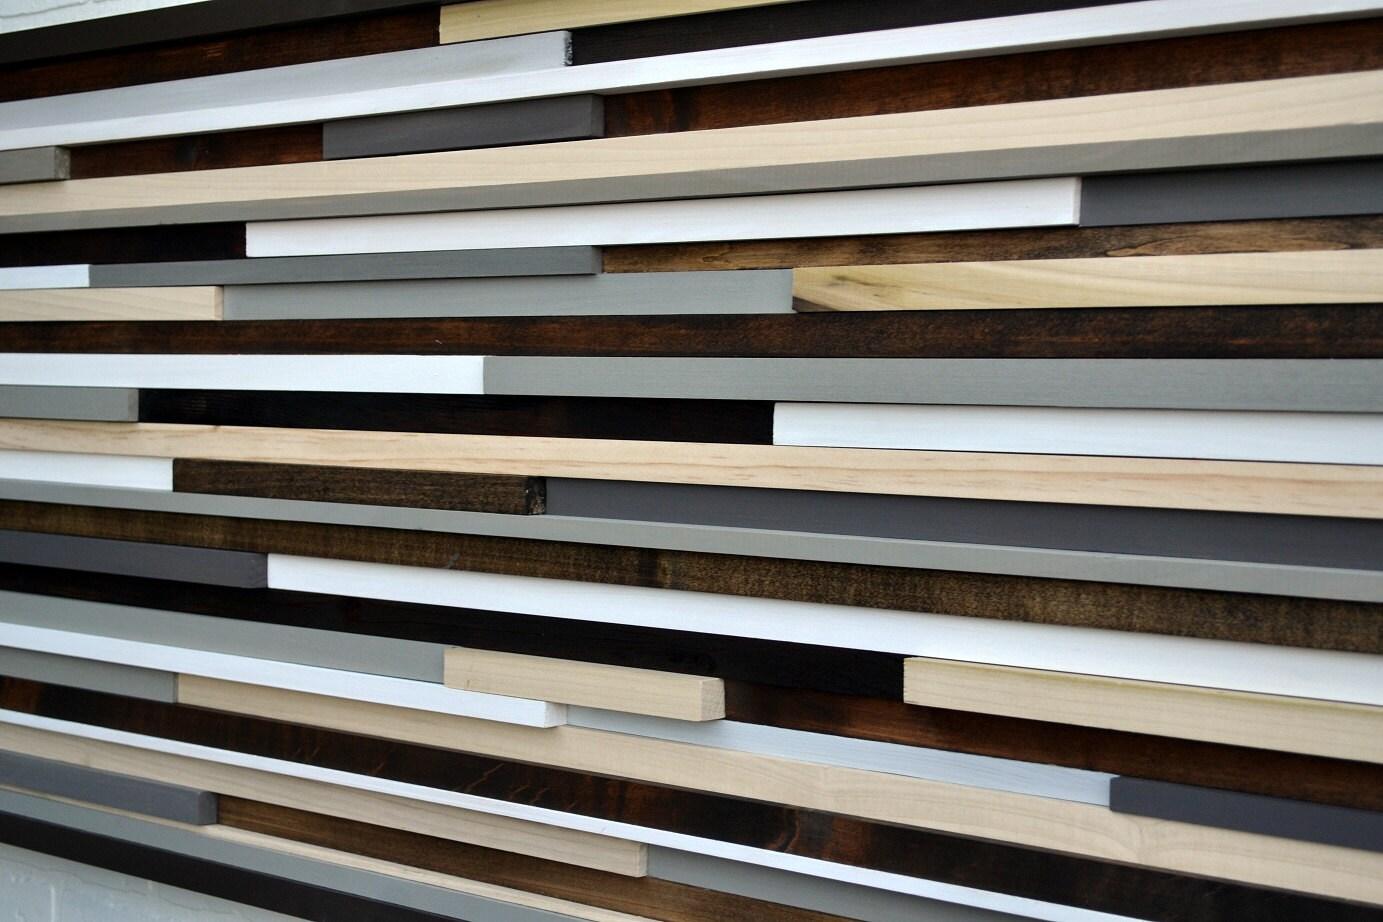 Reclaimed Wood Wall Art Wood Sculpture Queen Headboard Wood Wall Art